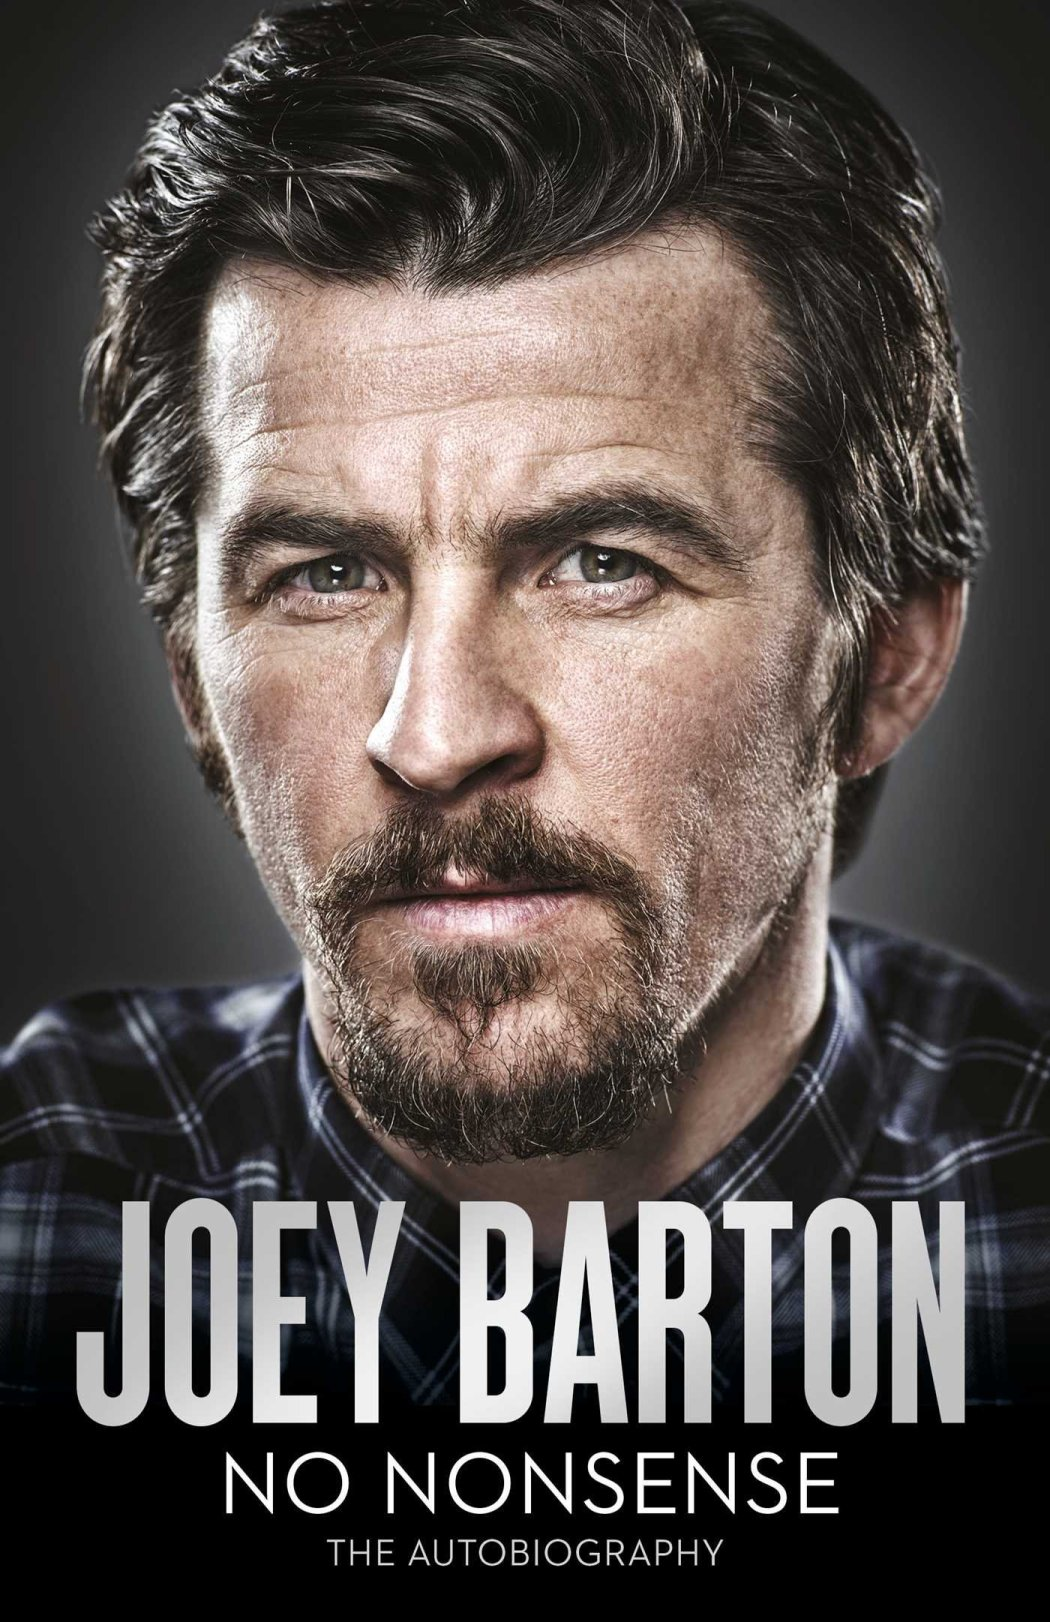 Joey Barton, LE bad boy du Football